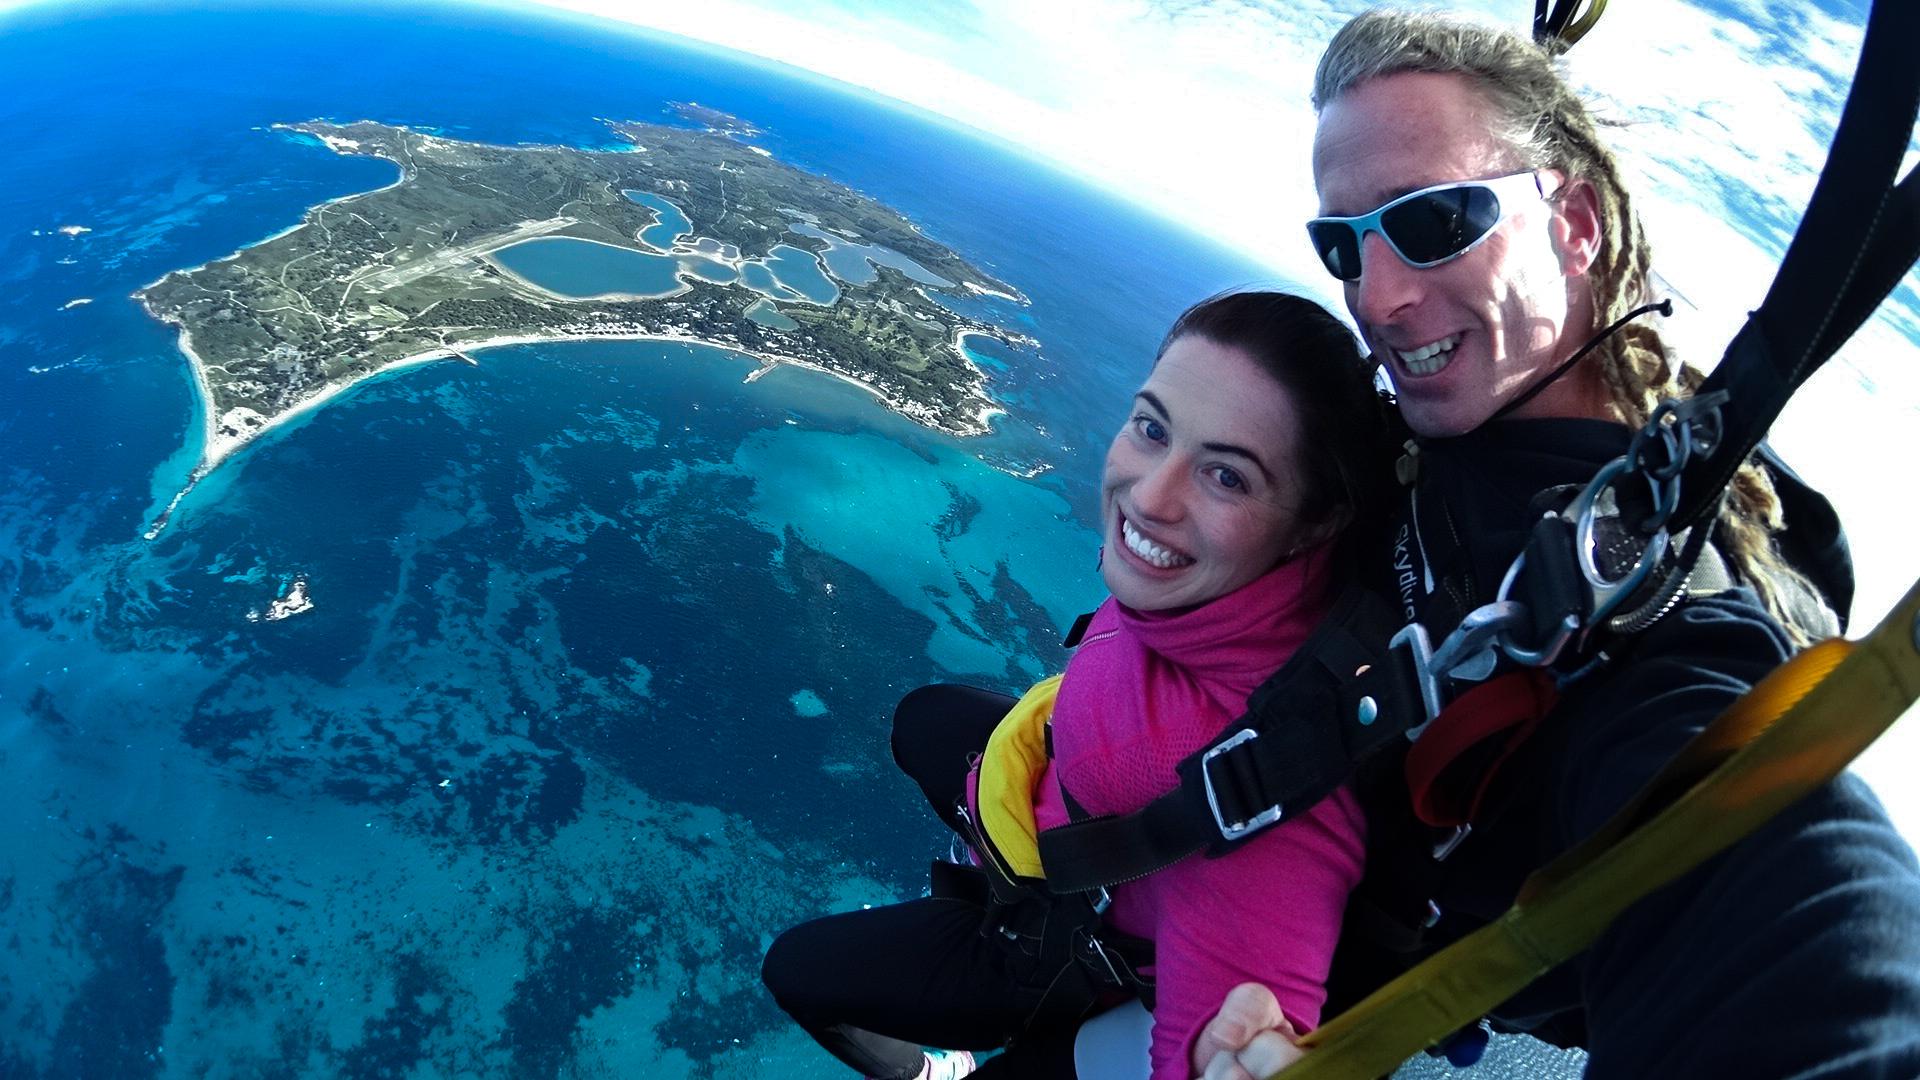 Rottnest Island Skydive in winter